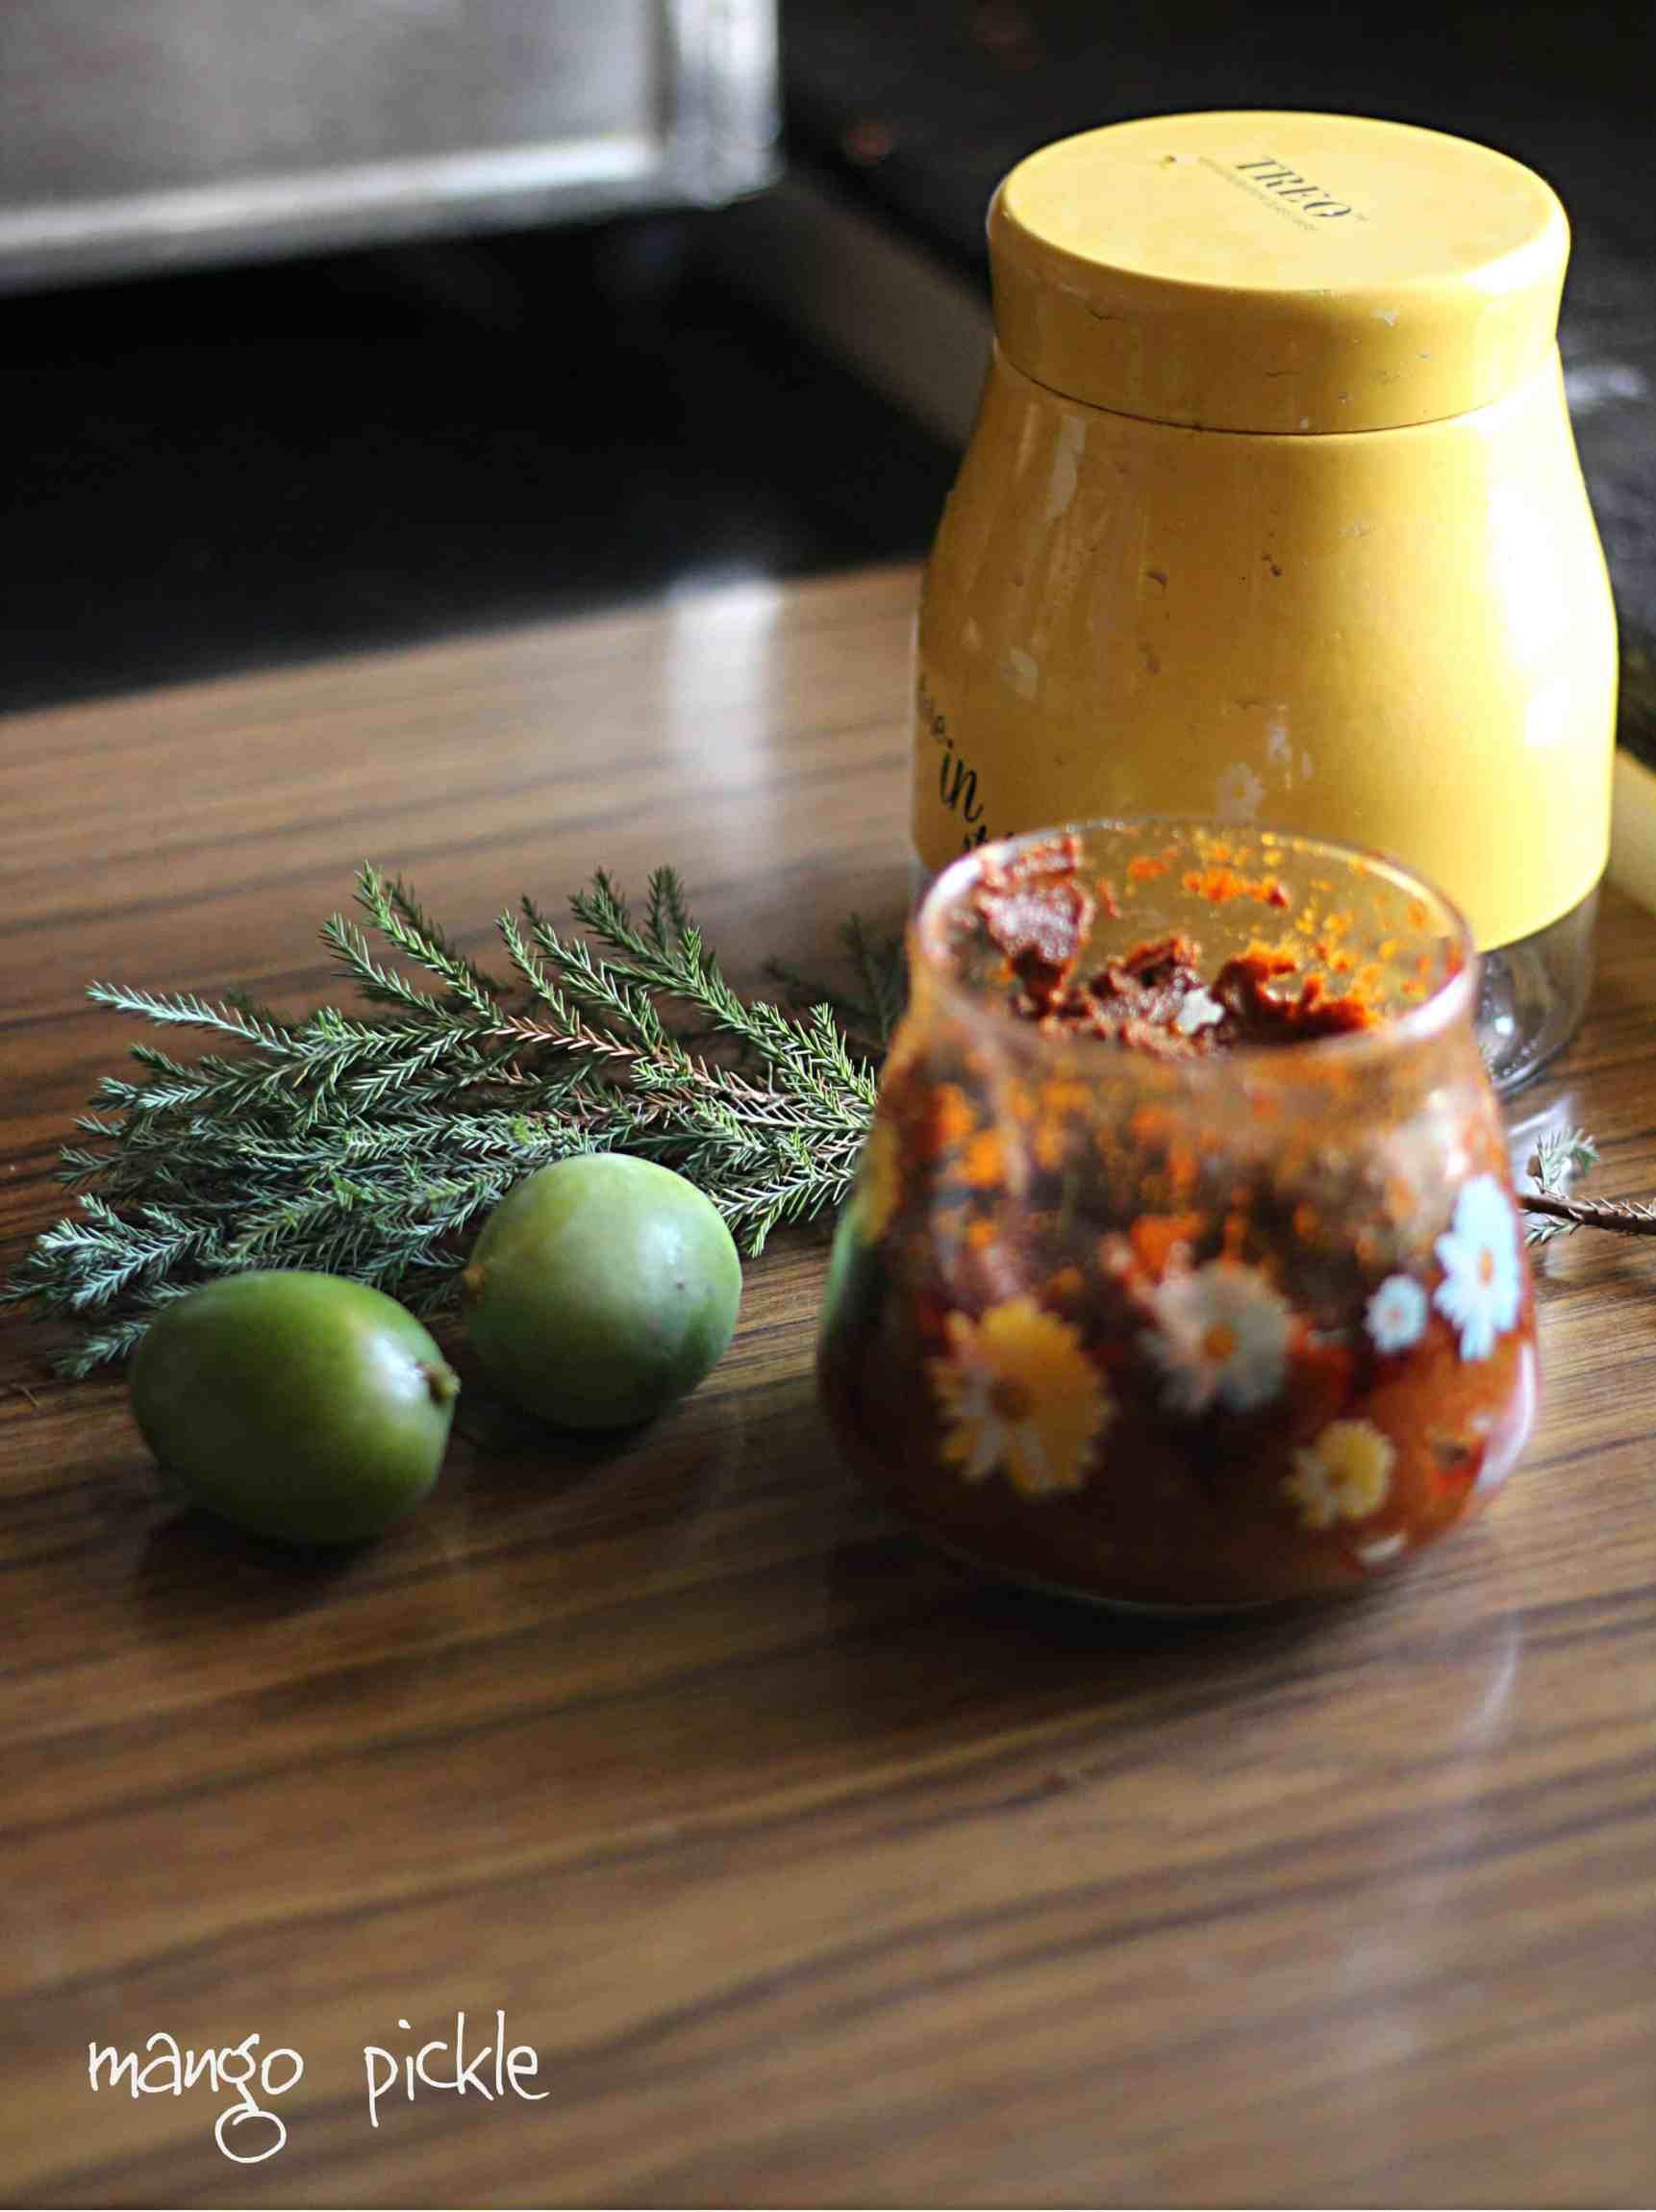 Tasty pickles online